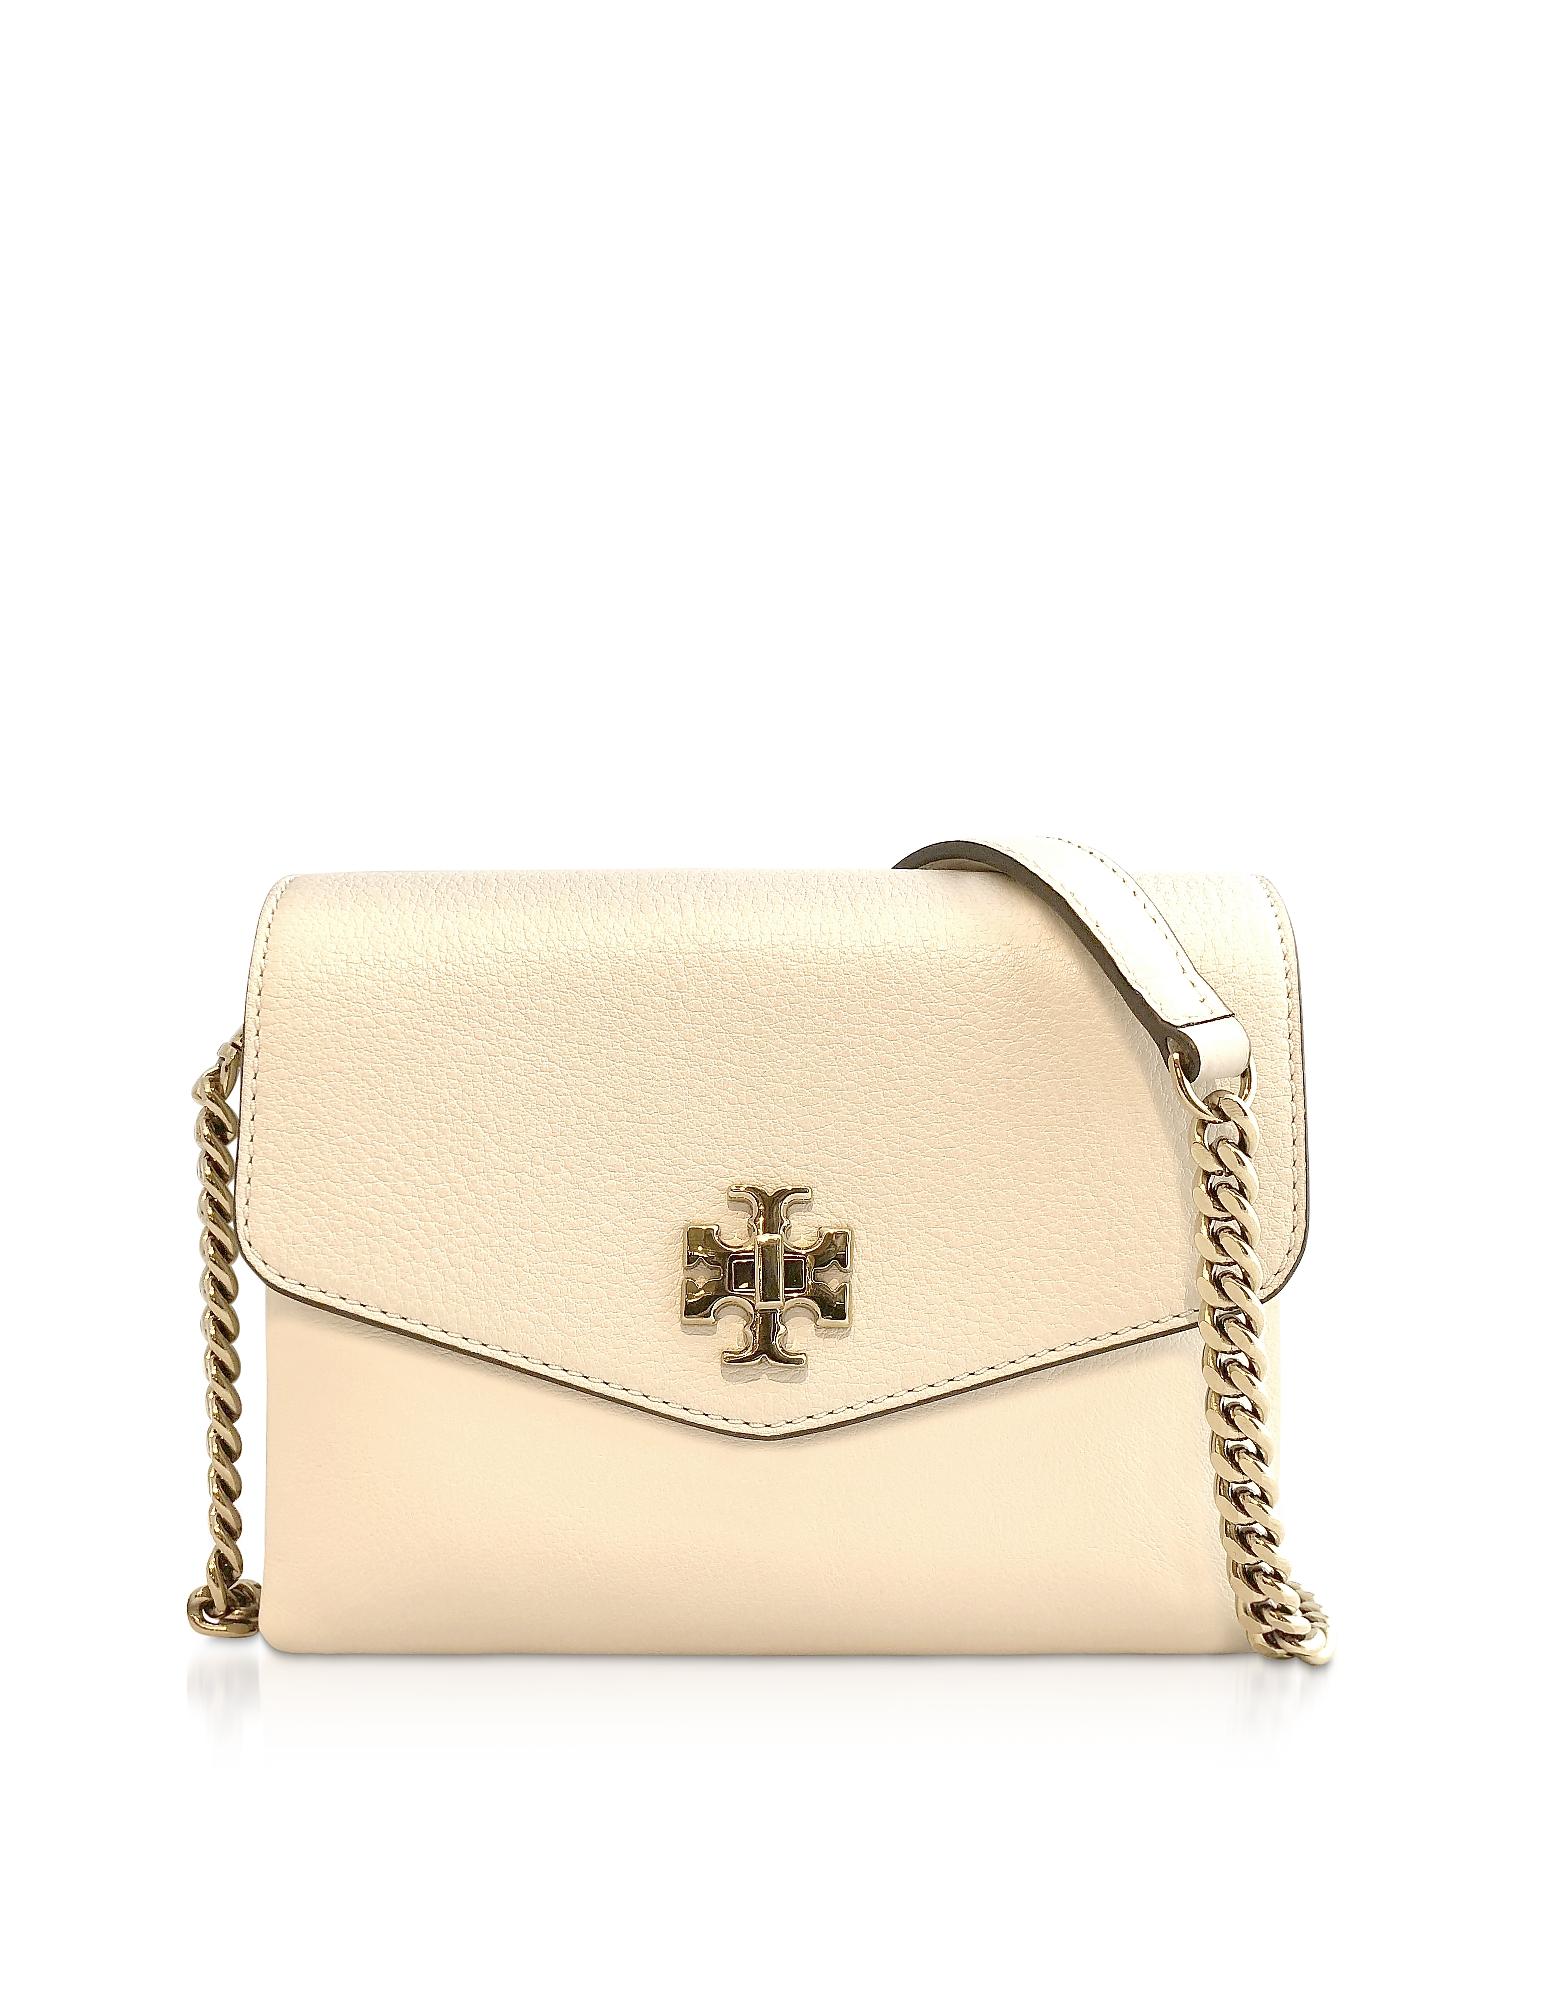 TORY BURCH | Tory Burch Designer Handbags, Kira Mix New Cream Mini Bag | Goxip